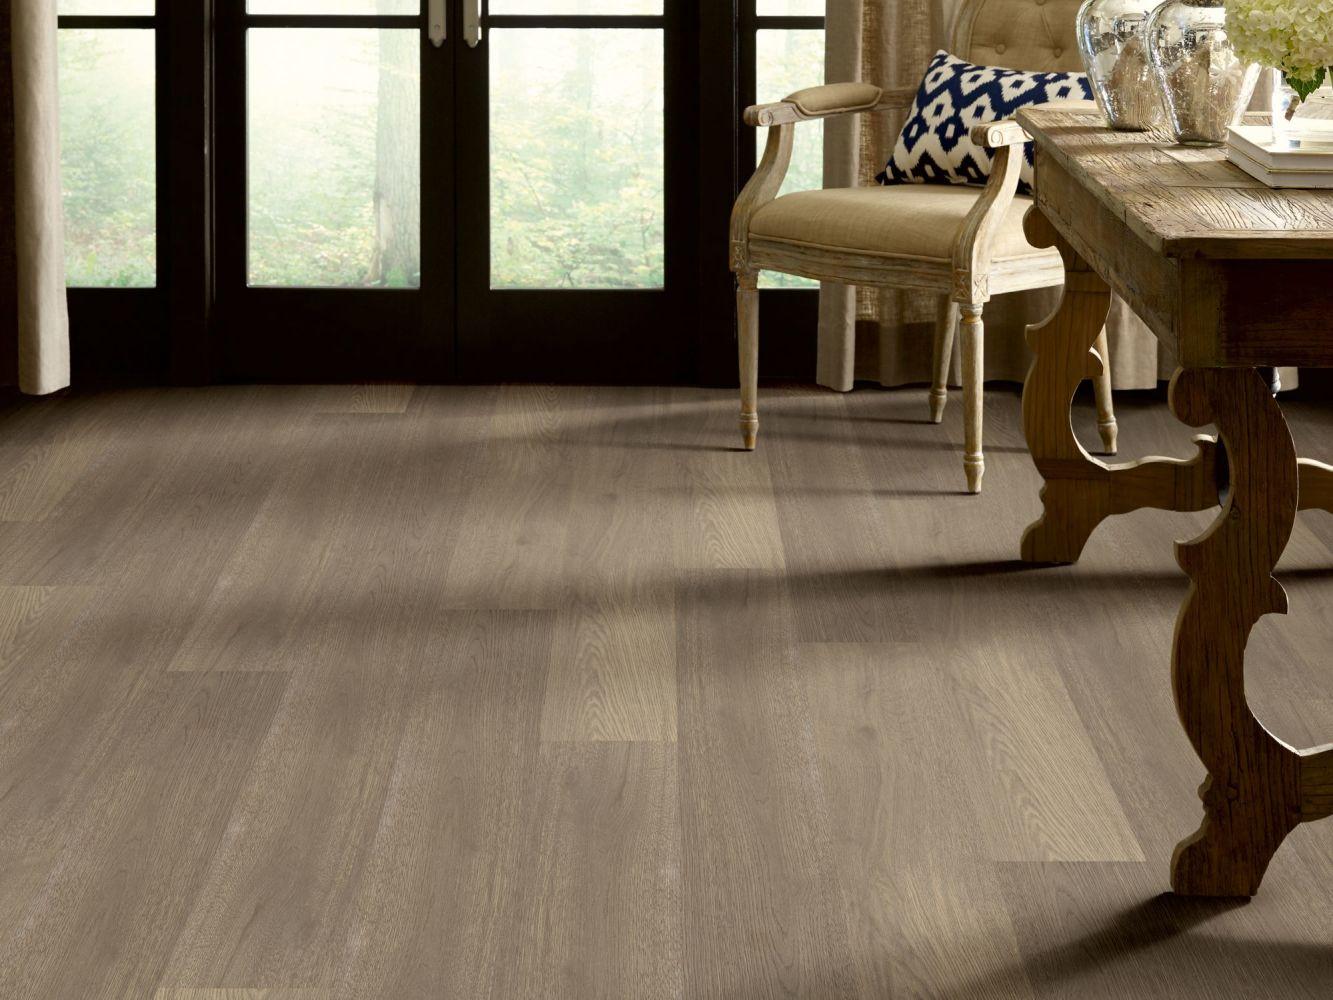 Shaw Floors Nfa HS Santa Maria Hdr Plus Cobblestone 05102_VH551